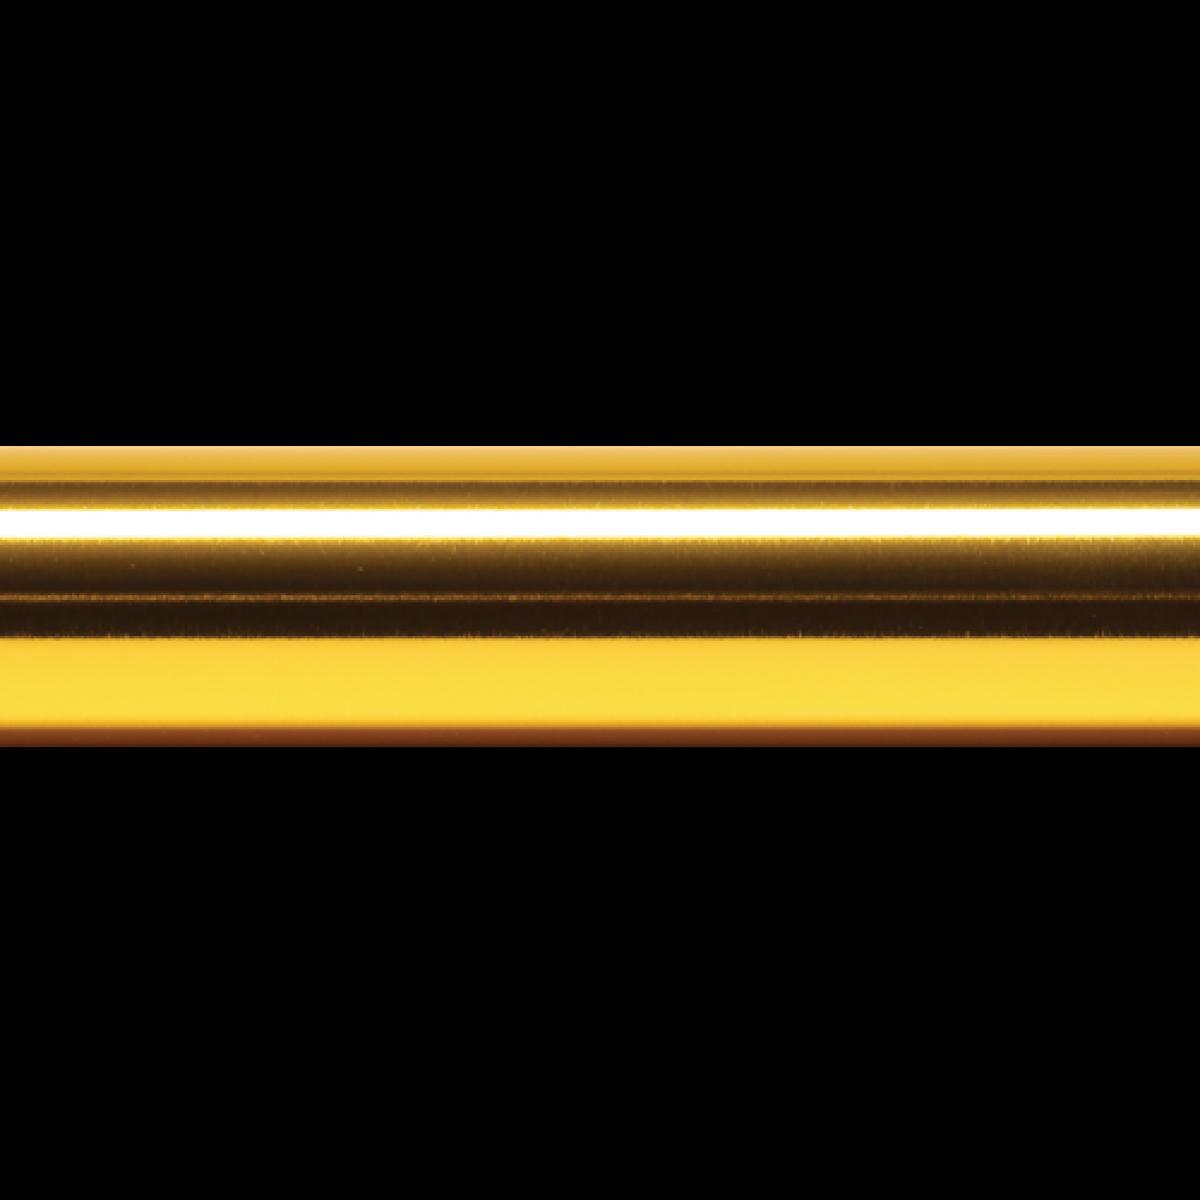 Sample Baton Base Color - Glossy Gold